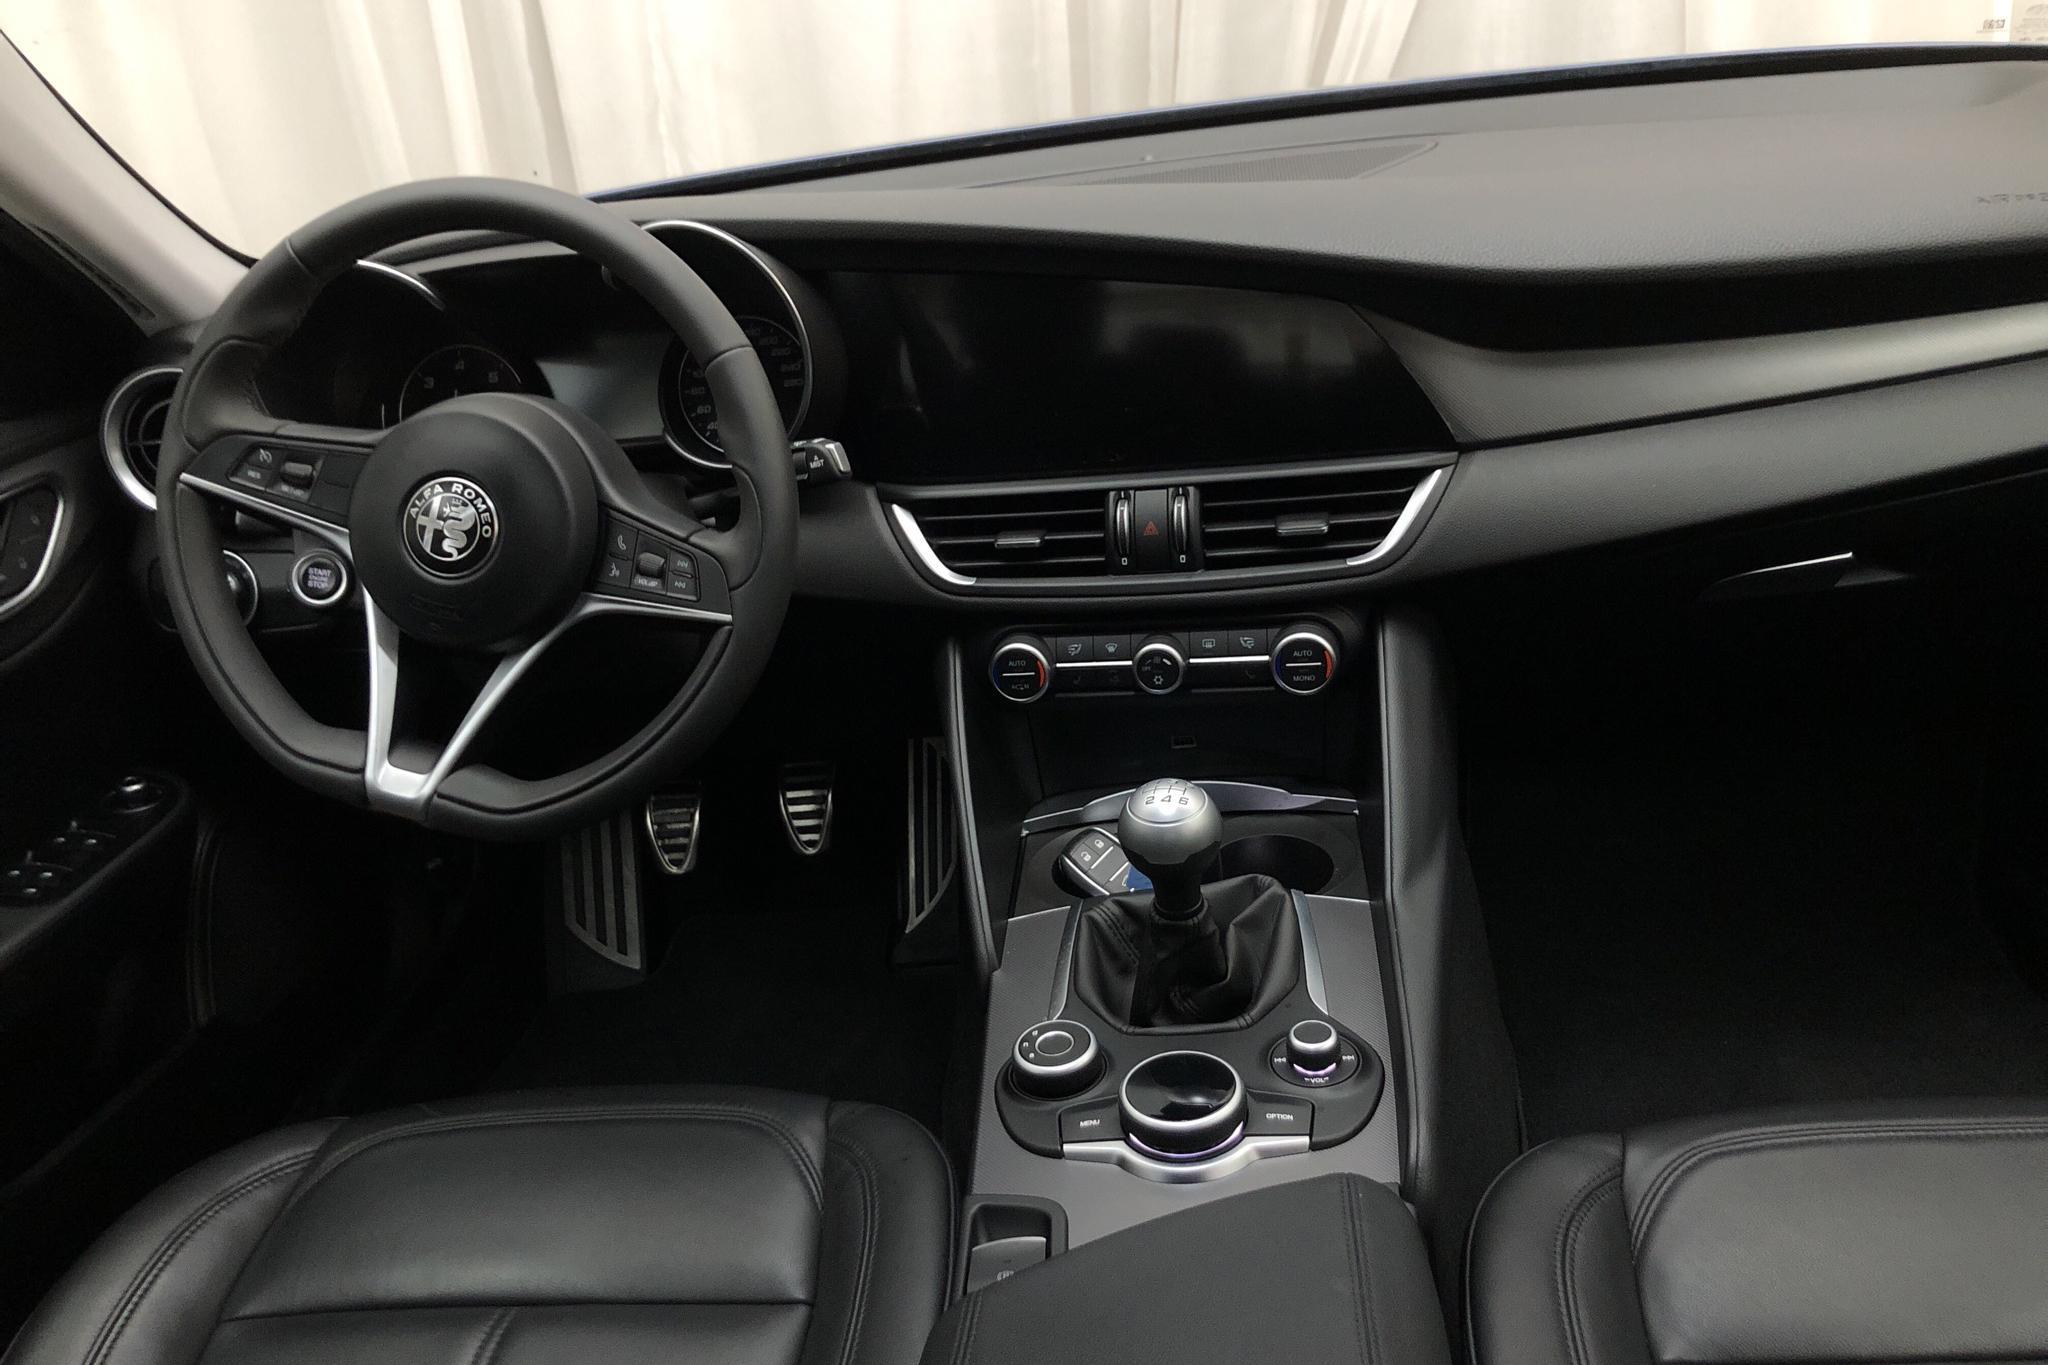 Alfa Romeo Giulia 2.2 (180hk) - 5 064 mil - Manuell - 2017